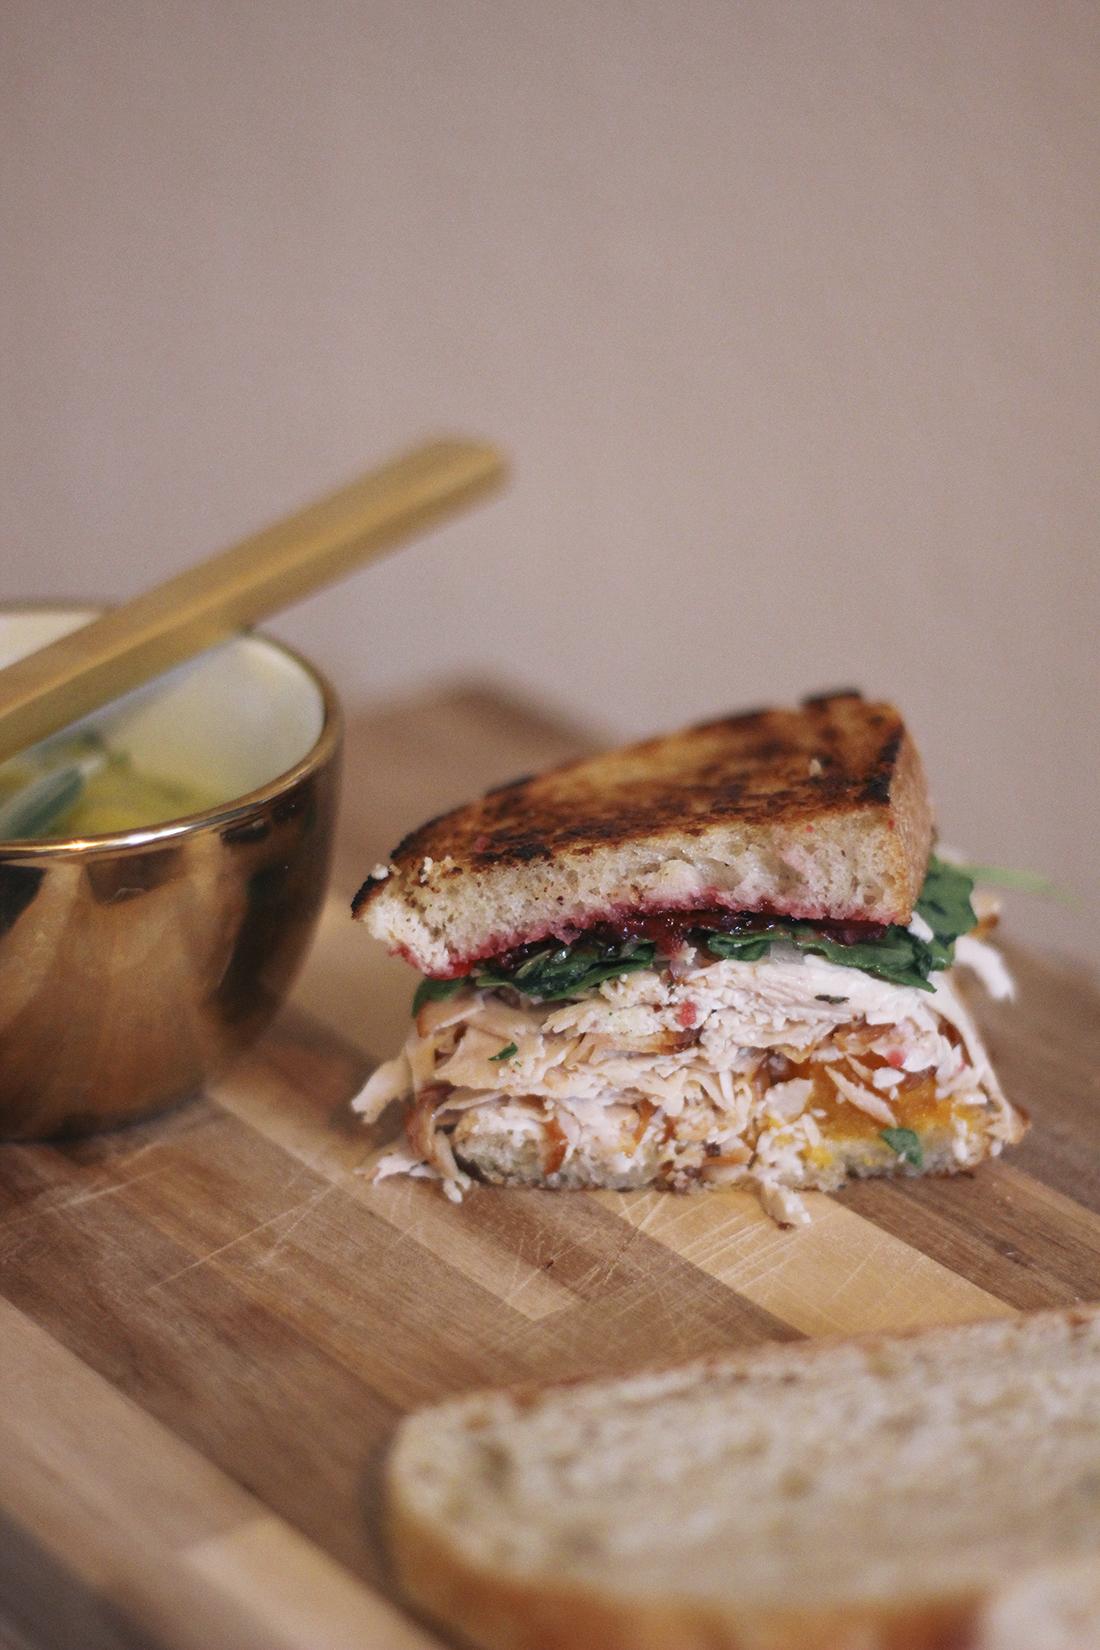 butternut-squash-turkey-sandwich-cranberry-sauce-3